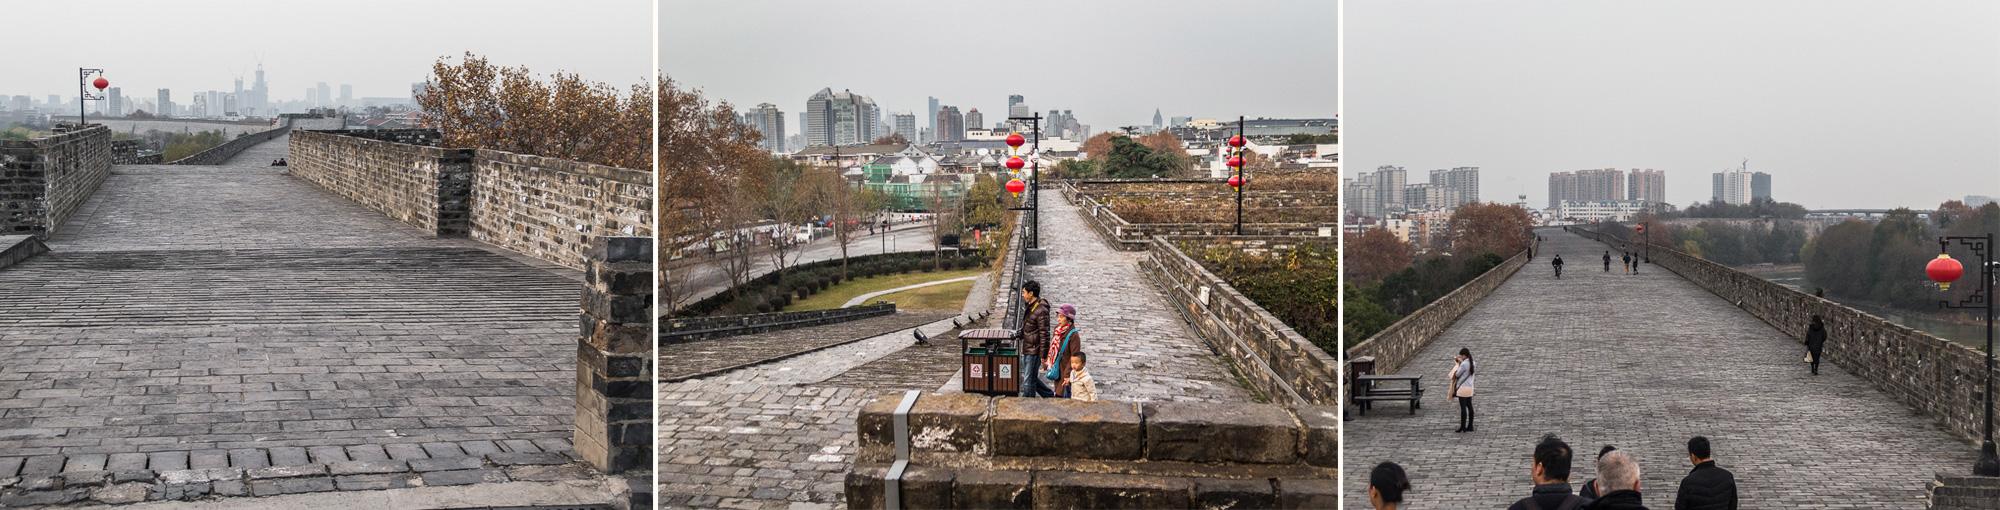 ming_city_wall3